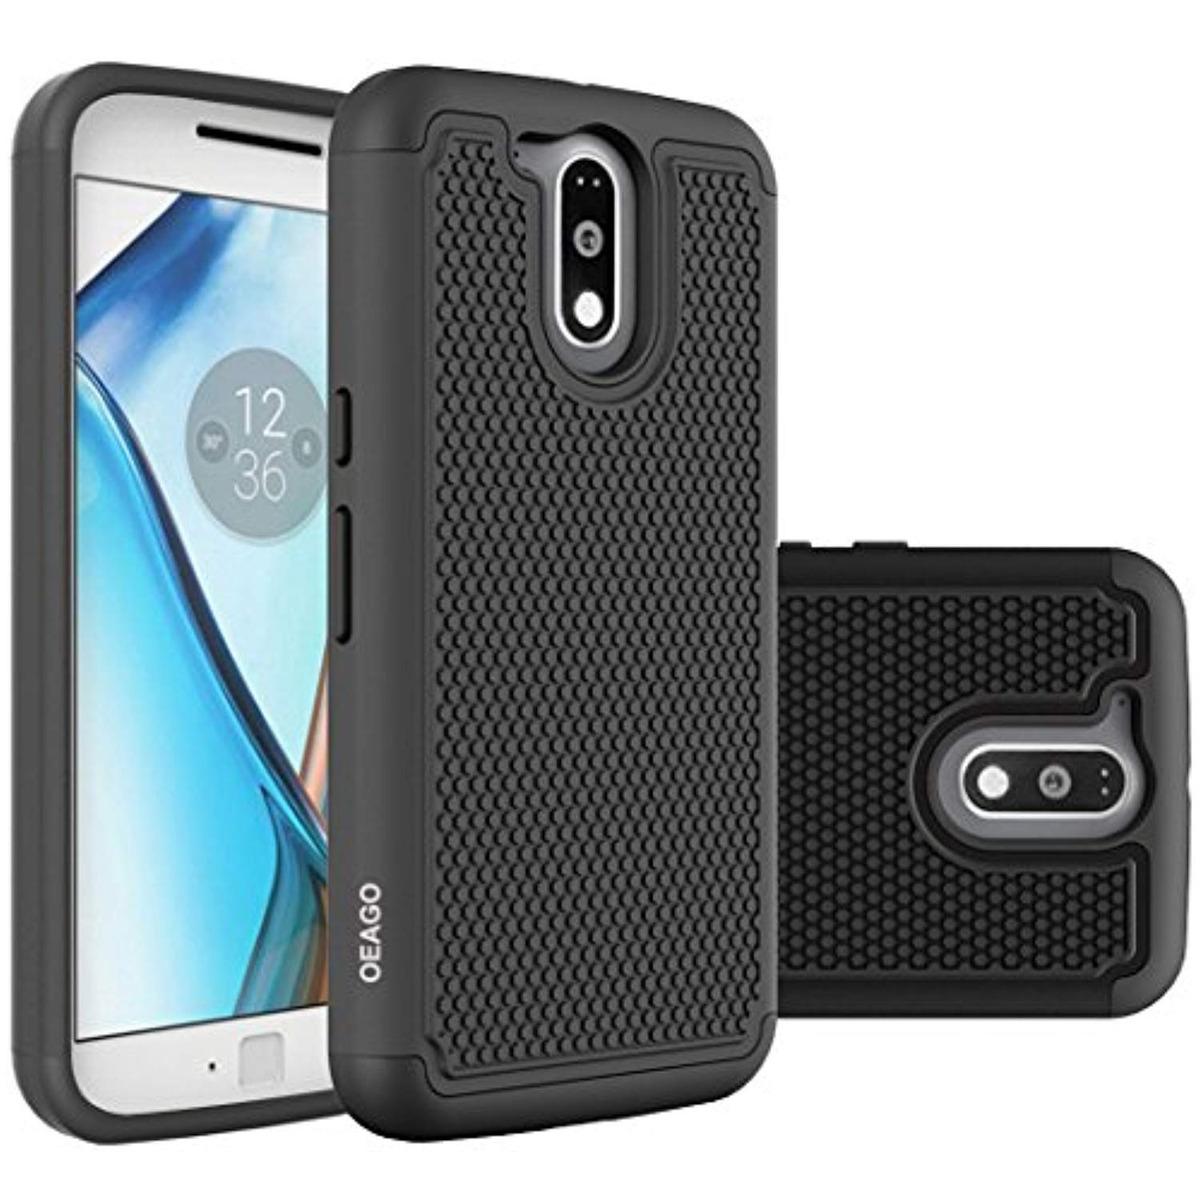 6c5fcfc277f Funda Motorola Estuche De Moto G4, G4 Plus - $ 955.05 en Mercado Libre